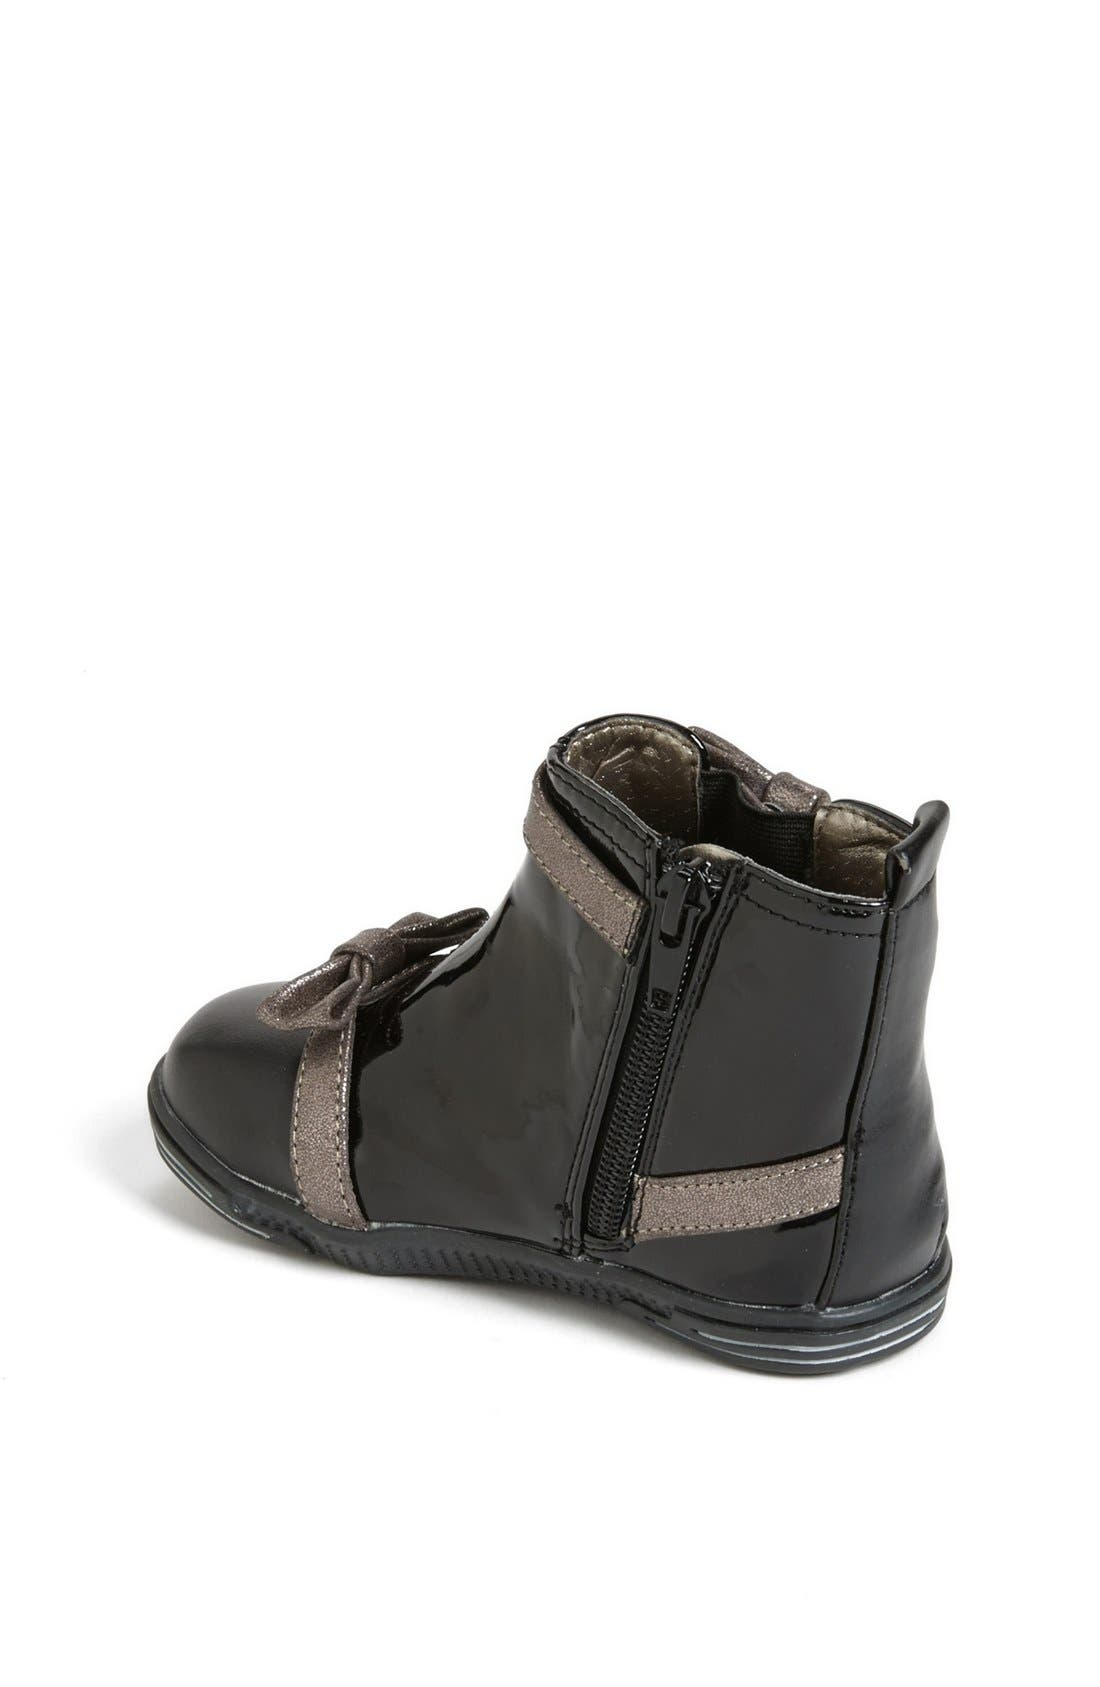 Alternate Image 2  - kensie girl Bow Boot (Walker & Toddler)